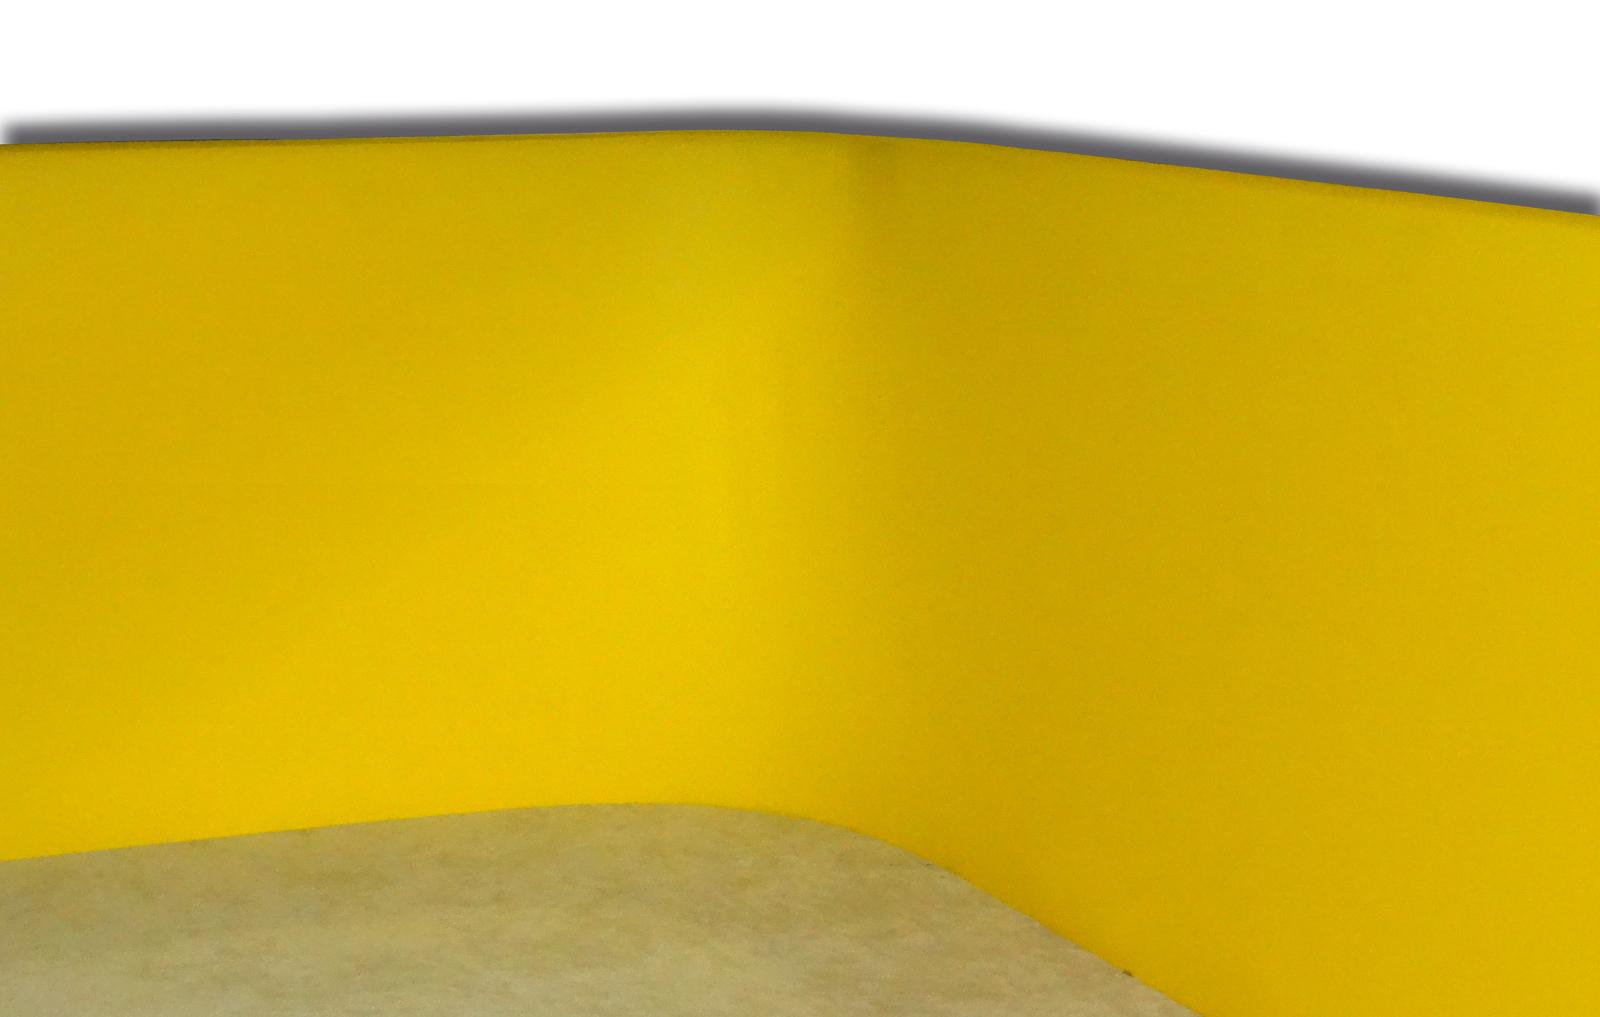 CANAPE ATOS - 135 x 190 cm